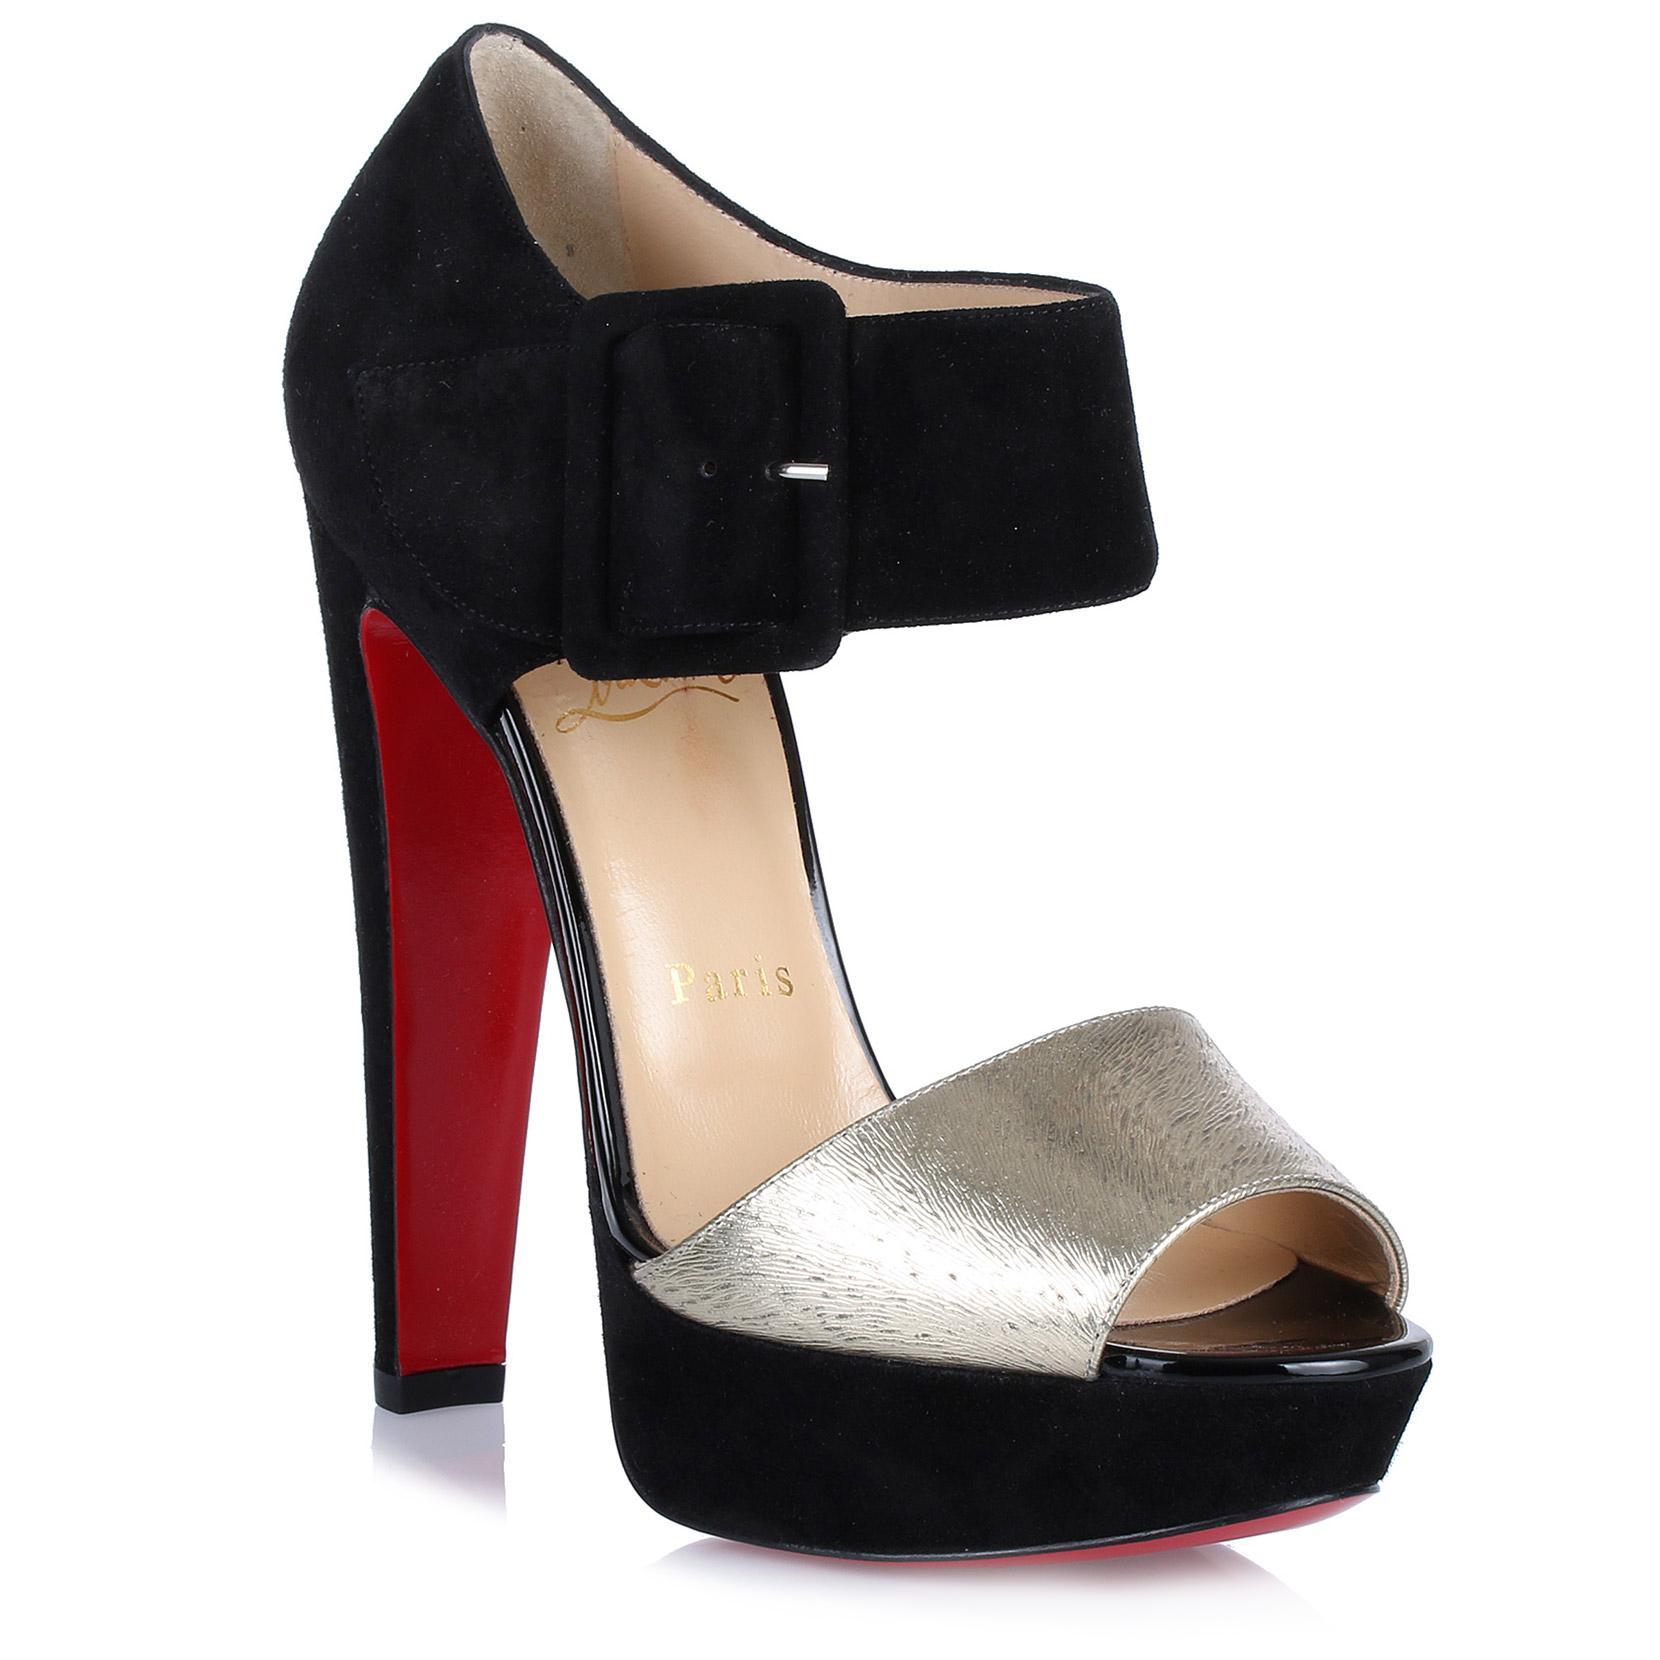 f4a68bd385ba Christian Louboutin Haute Retenue Black Suede Sandal in Black - Lyst